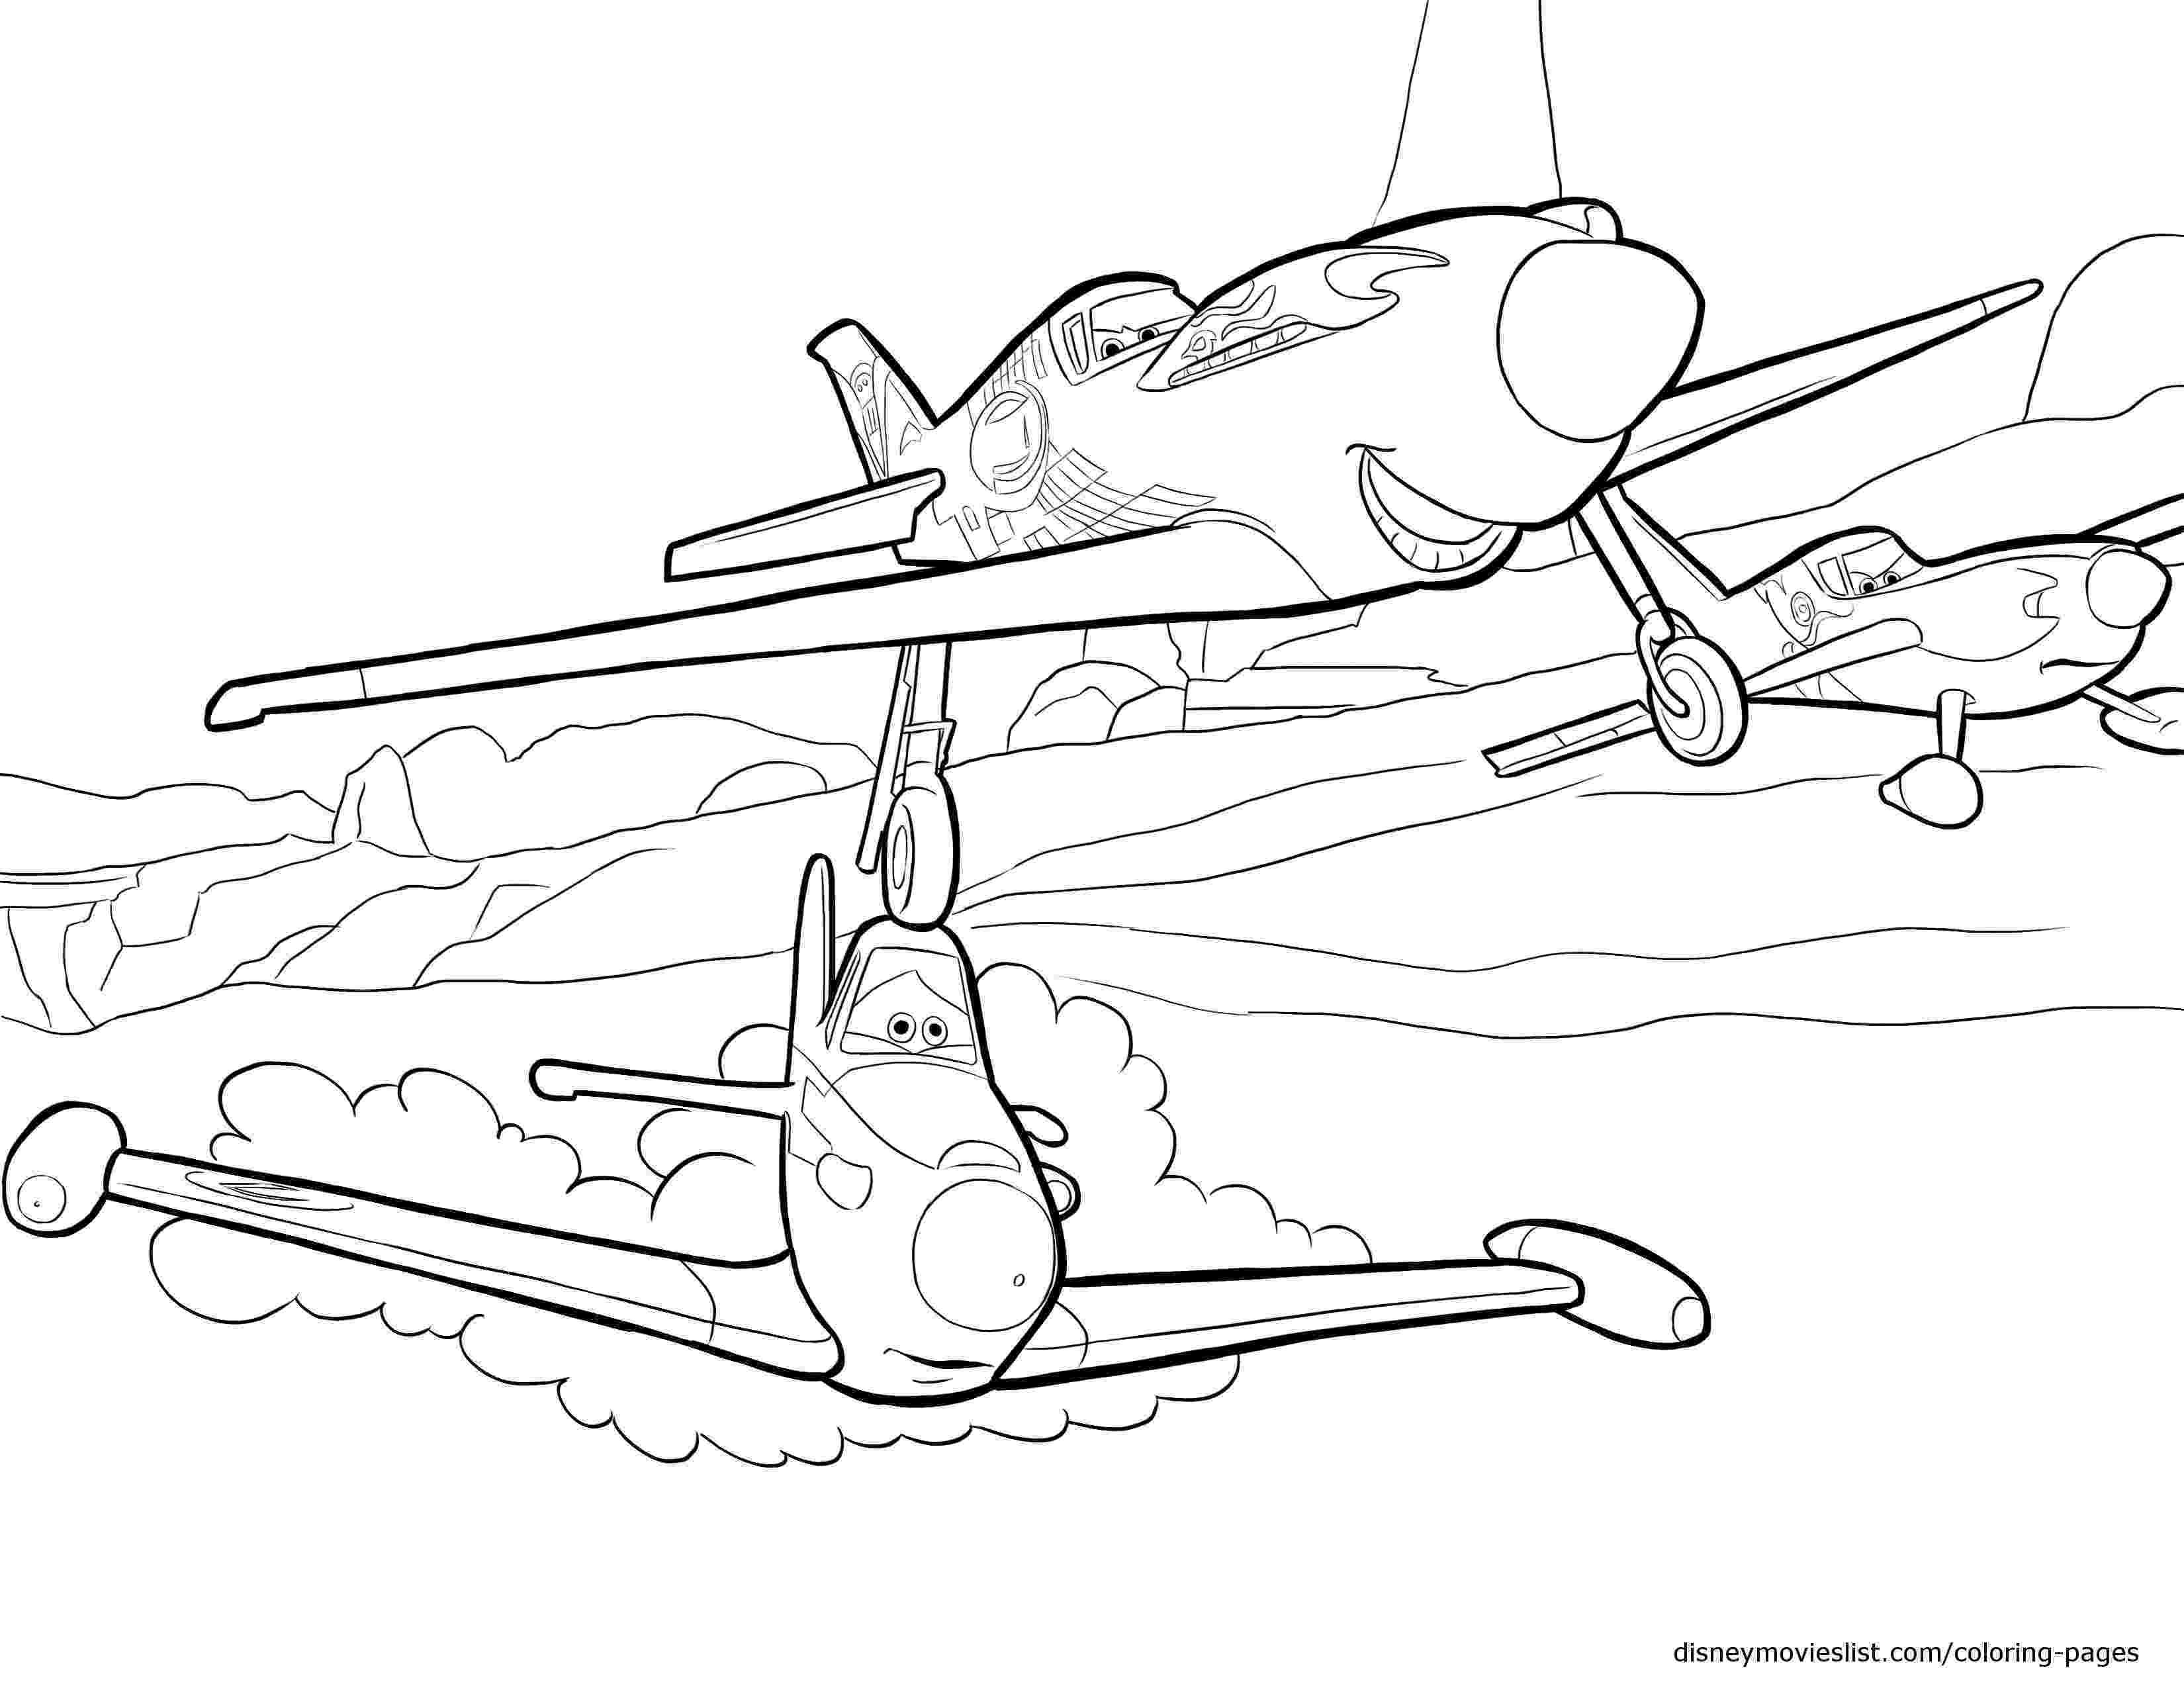 plane coloring page free printable airplane coloring pages for kids cool2bkids plane coloring page